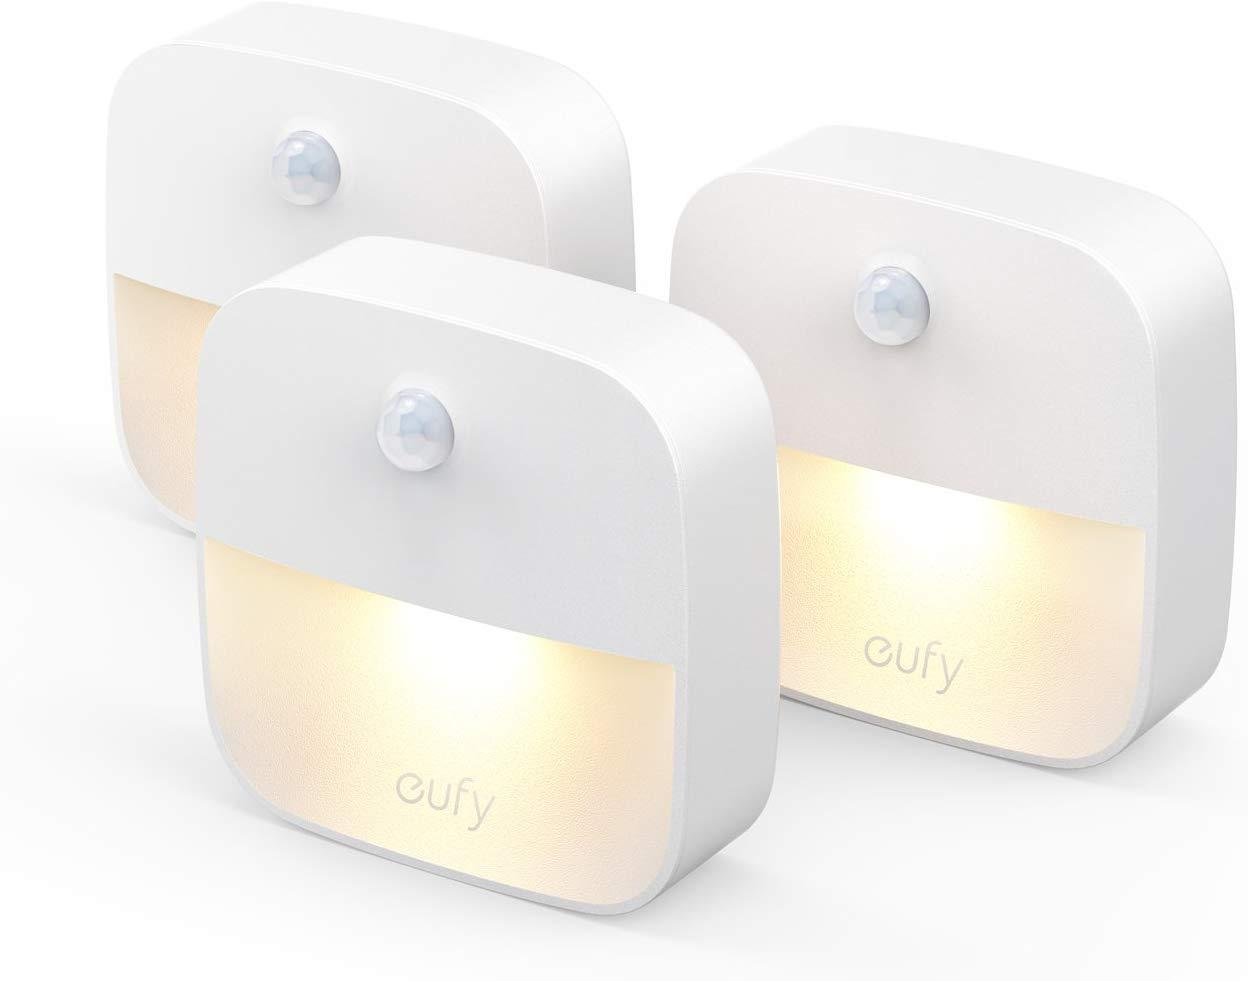 [3 pack] Eufy Stick On Night Light with Motion Sensor - $11.99 + FSSS